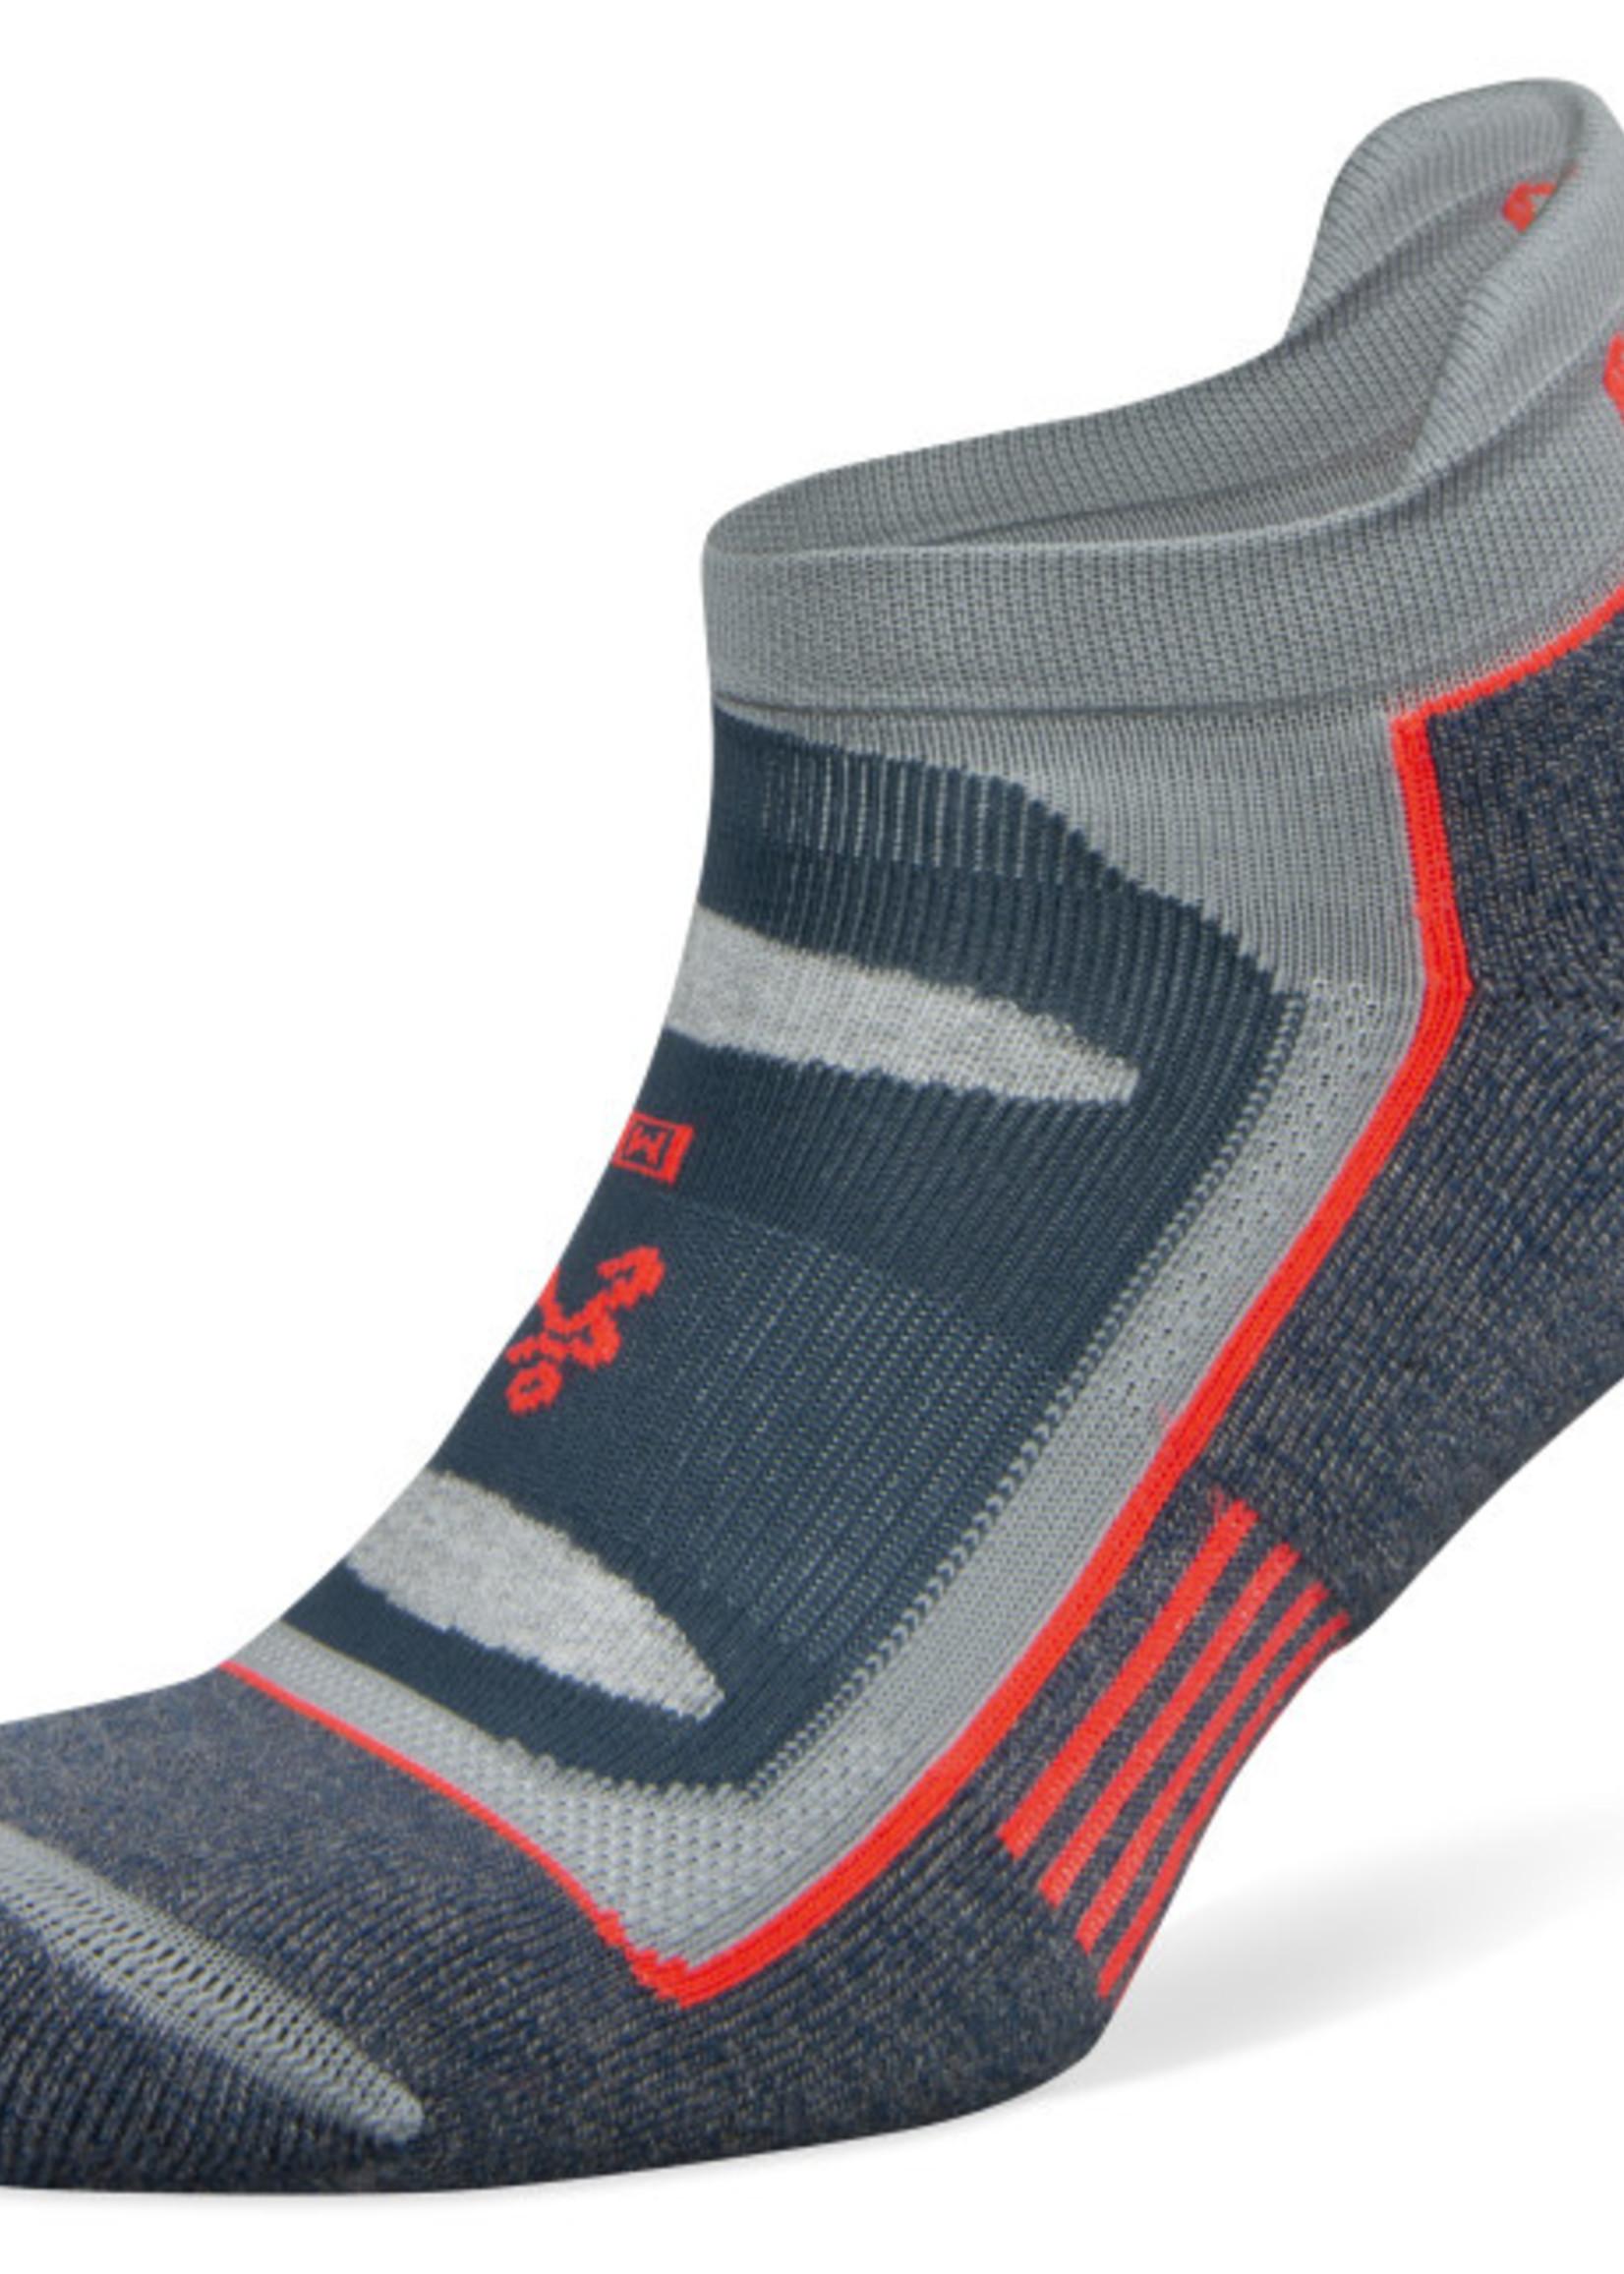 Balega Balega Blister Resist No Show Sock